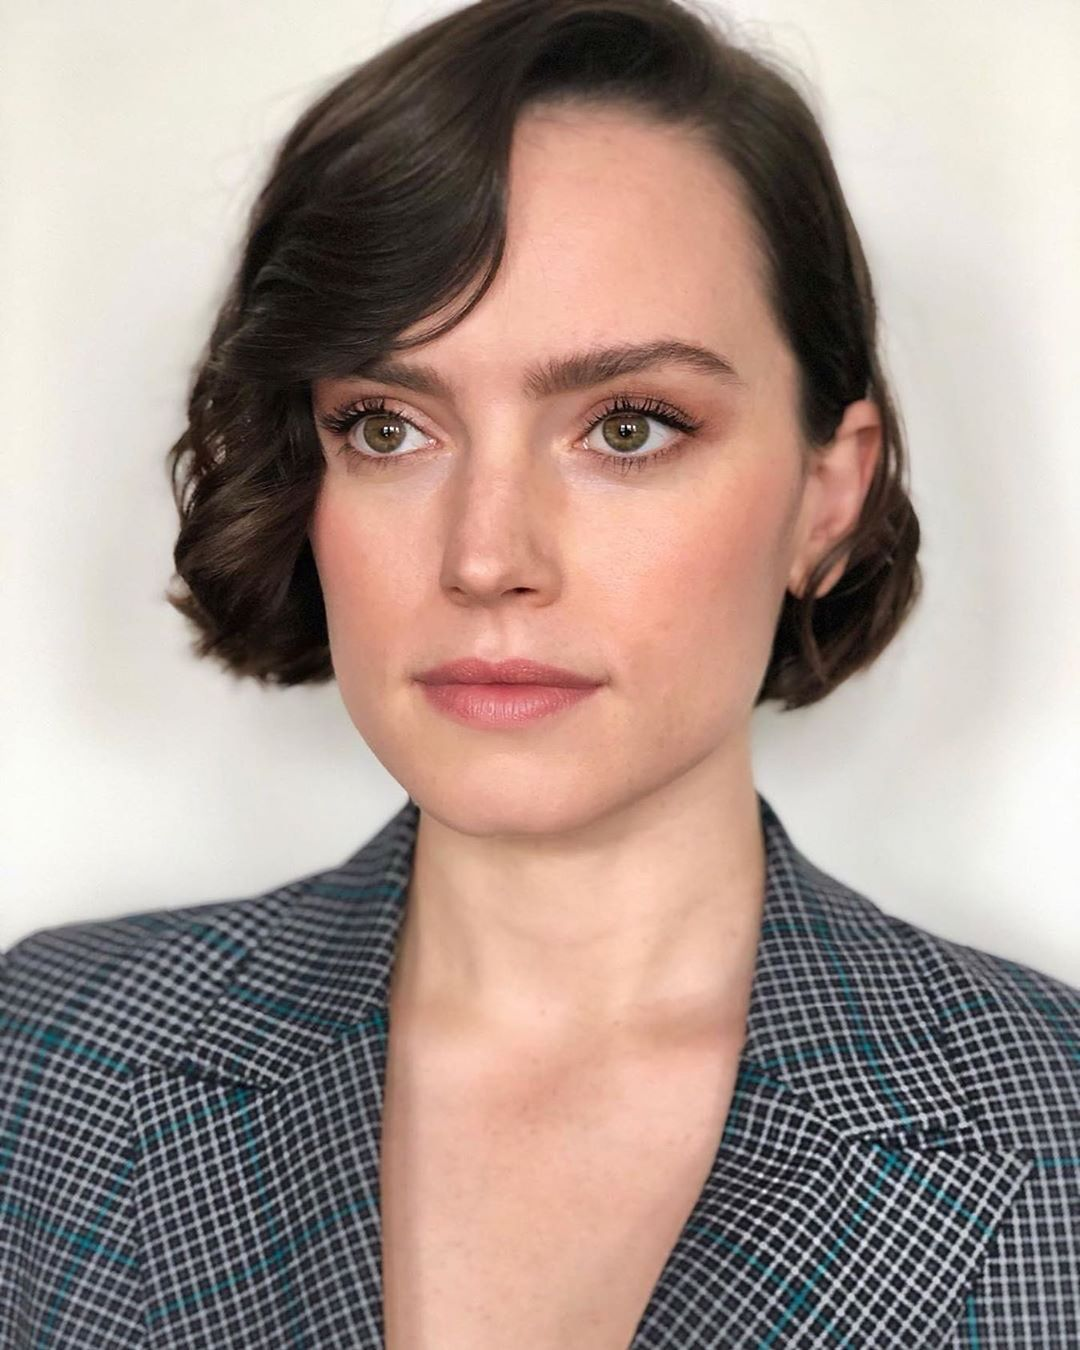 Pin By Sascha Mathzeit On Daisey Ridley In 2020 Daisy Ridley Daisy Ridley Star Wars Daisy